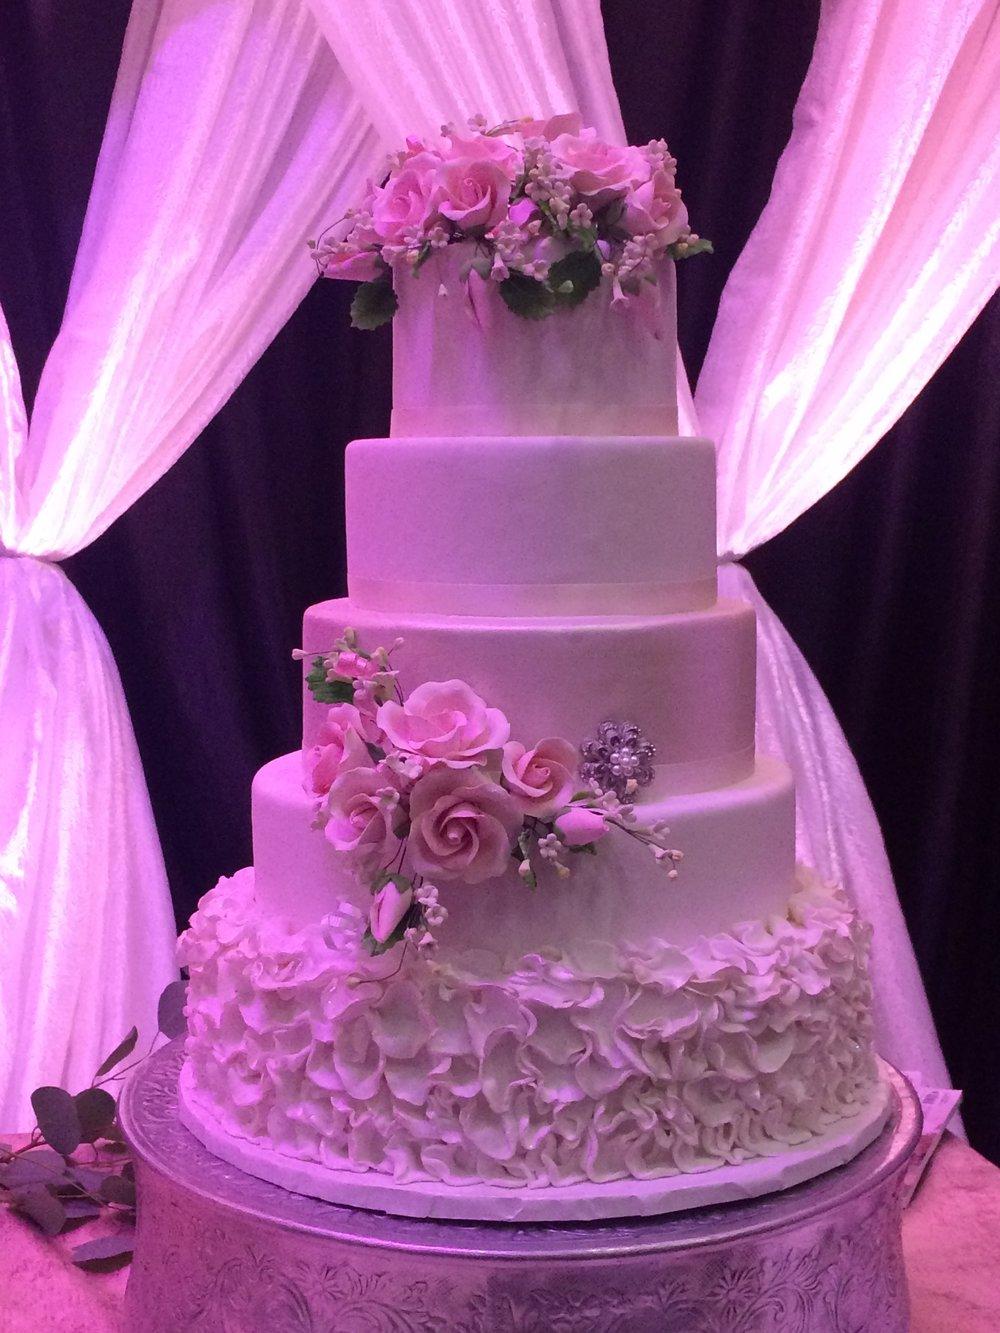 columbus best wedding photographers, high end wedding photos, wedding photography ohio, best photographers ohio, hilton wedding, celebrity wedding photographer